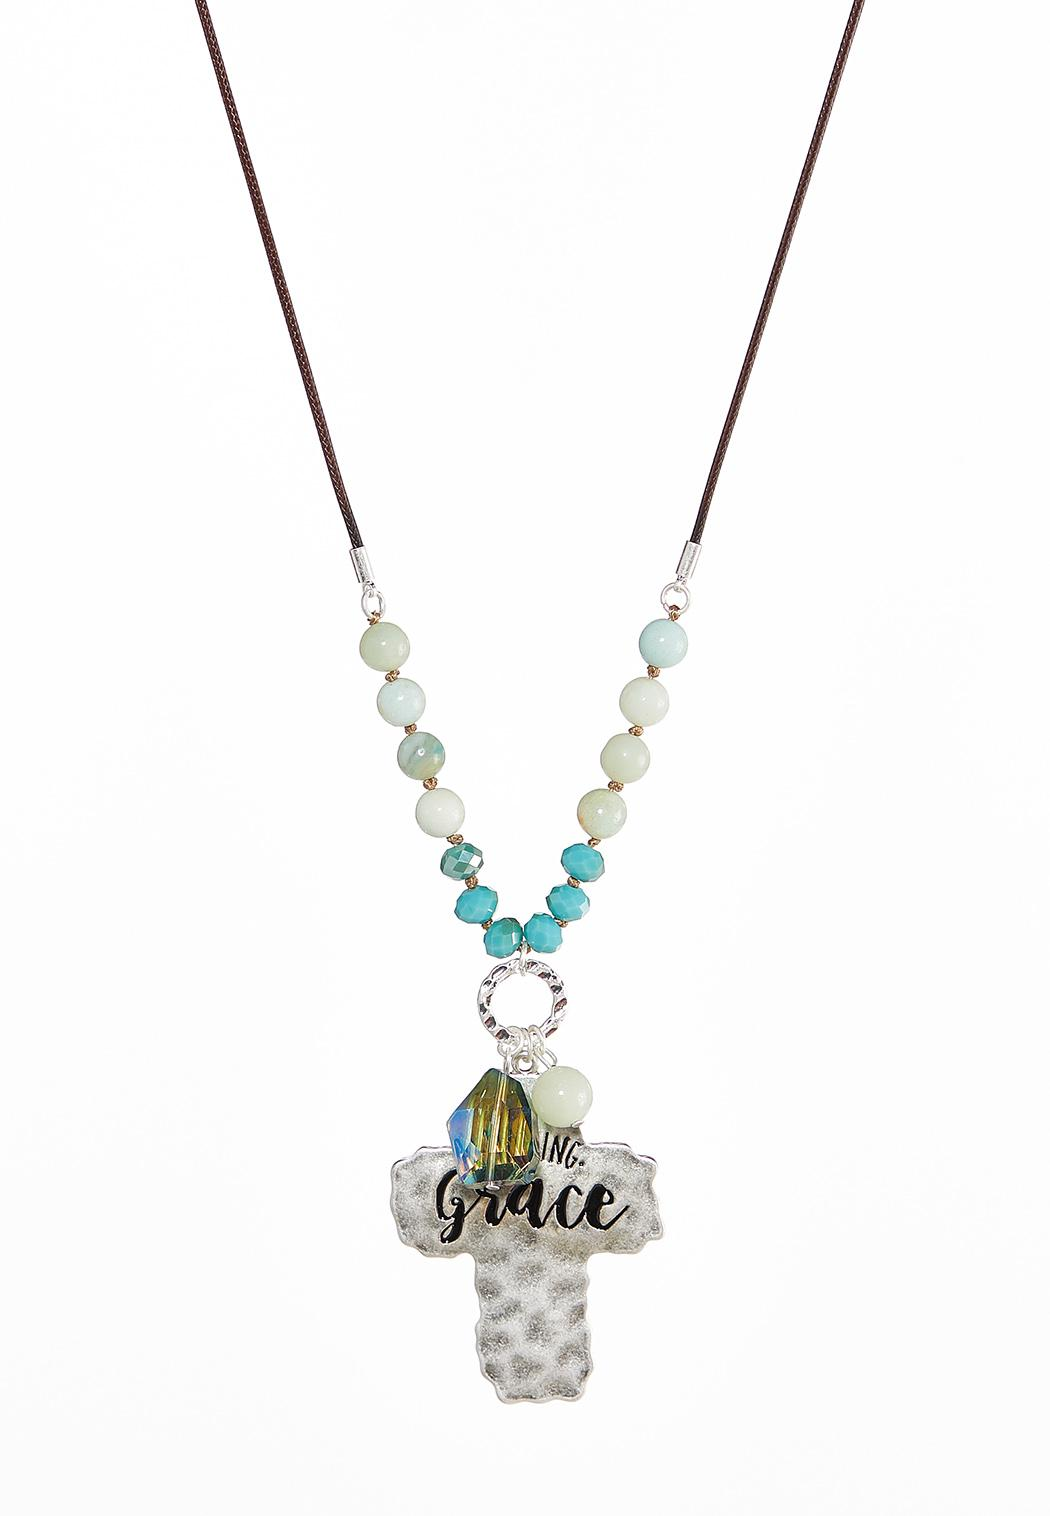 Grace Cross Pendant Necklace